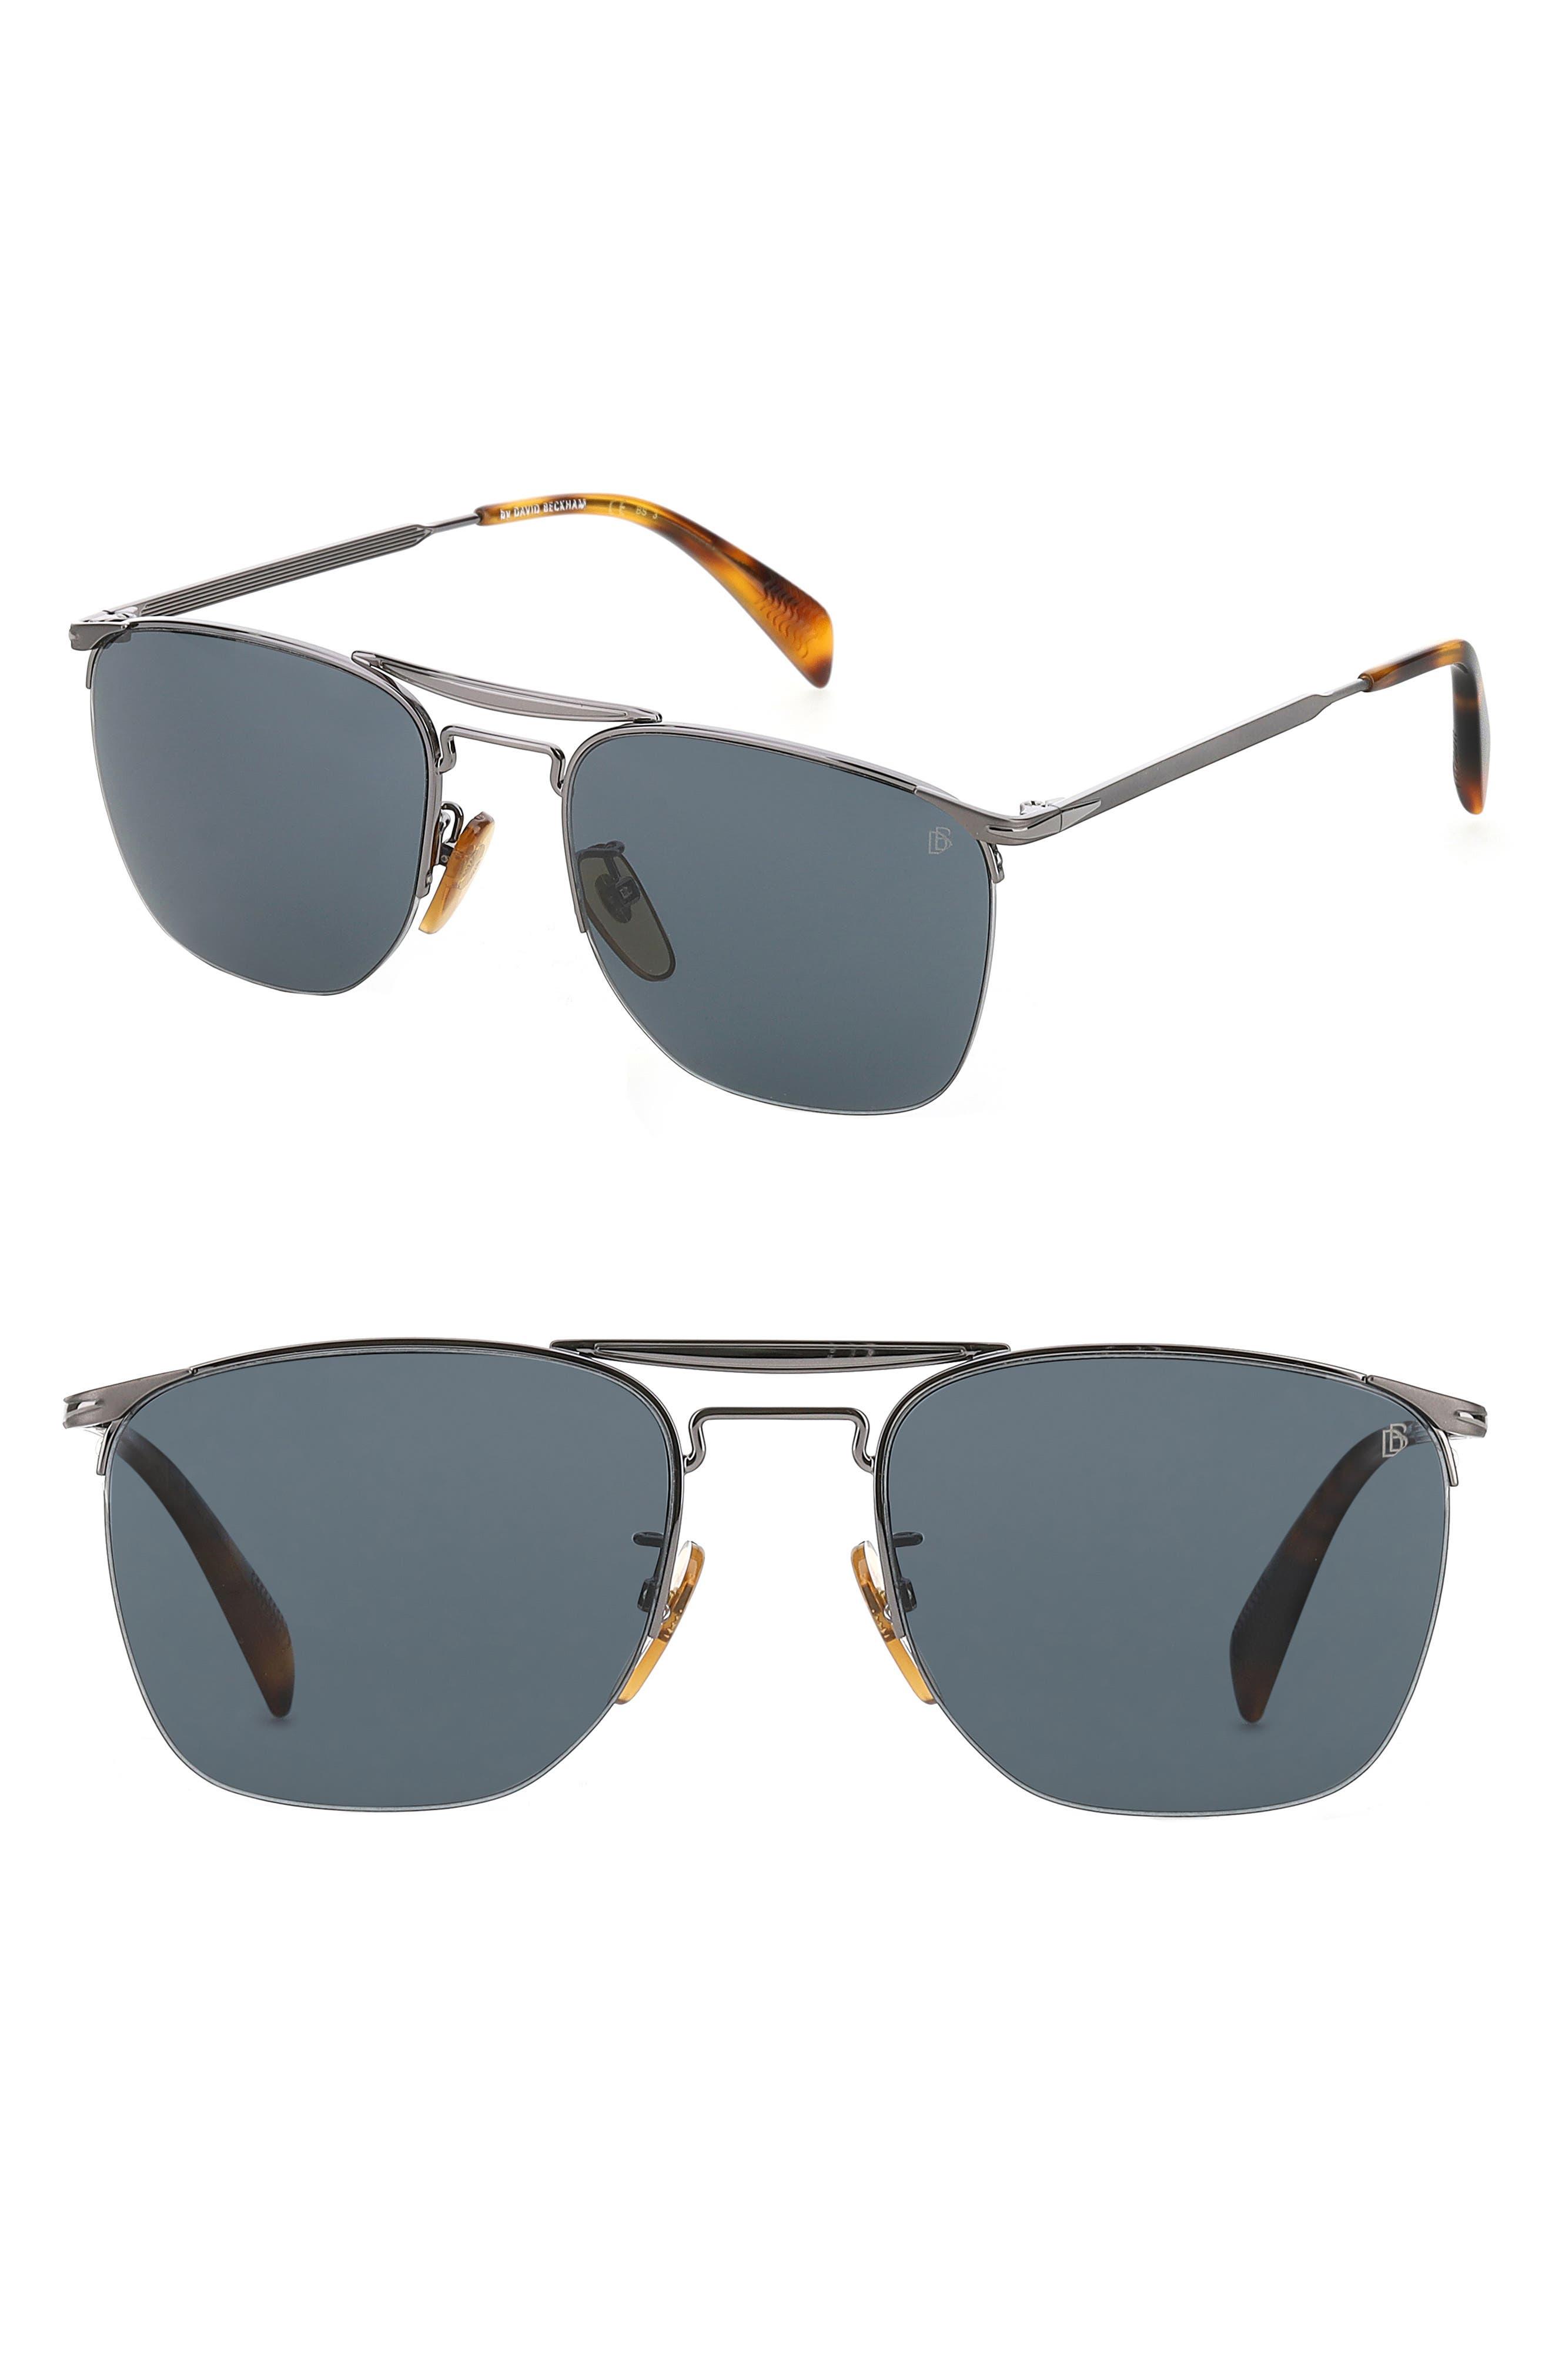 Men's Eyewear By David Beckham Db 1001/s 56mm Aviator Sunglasses